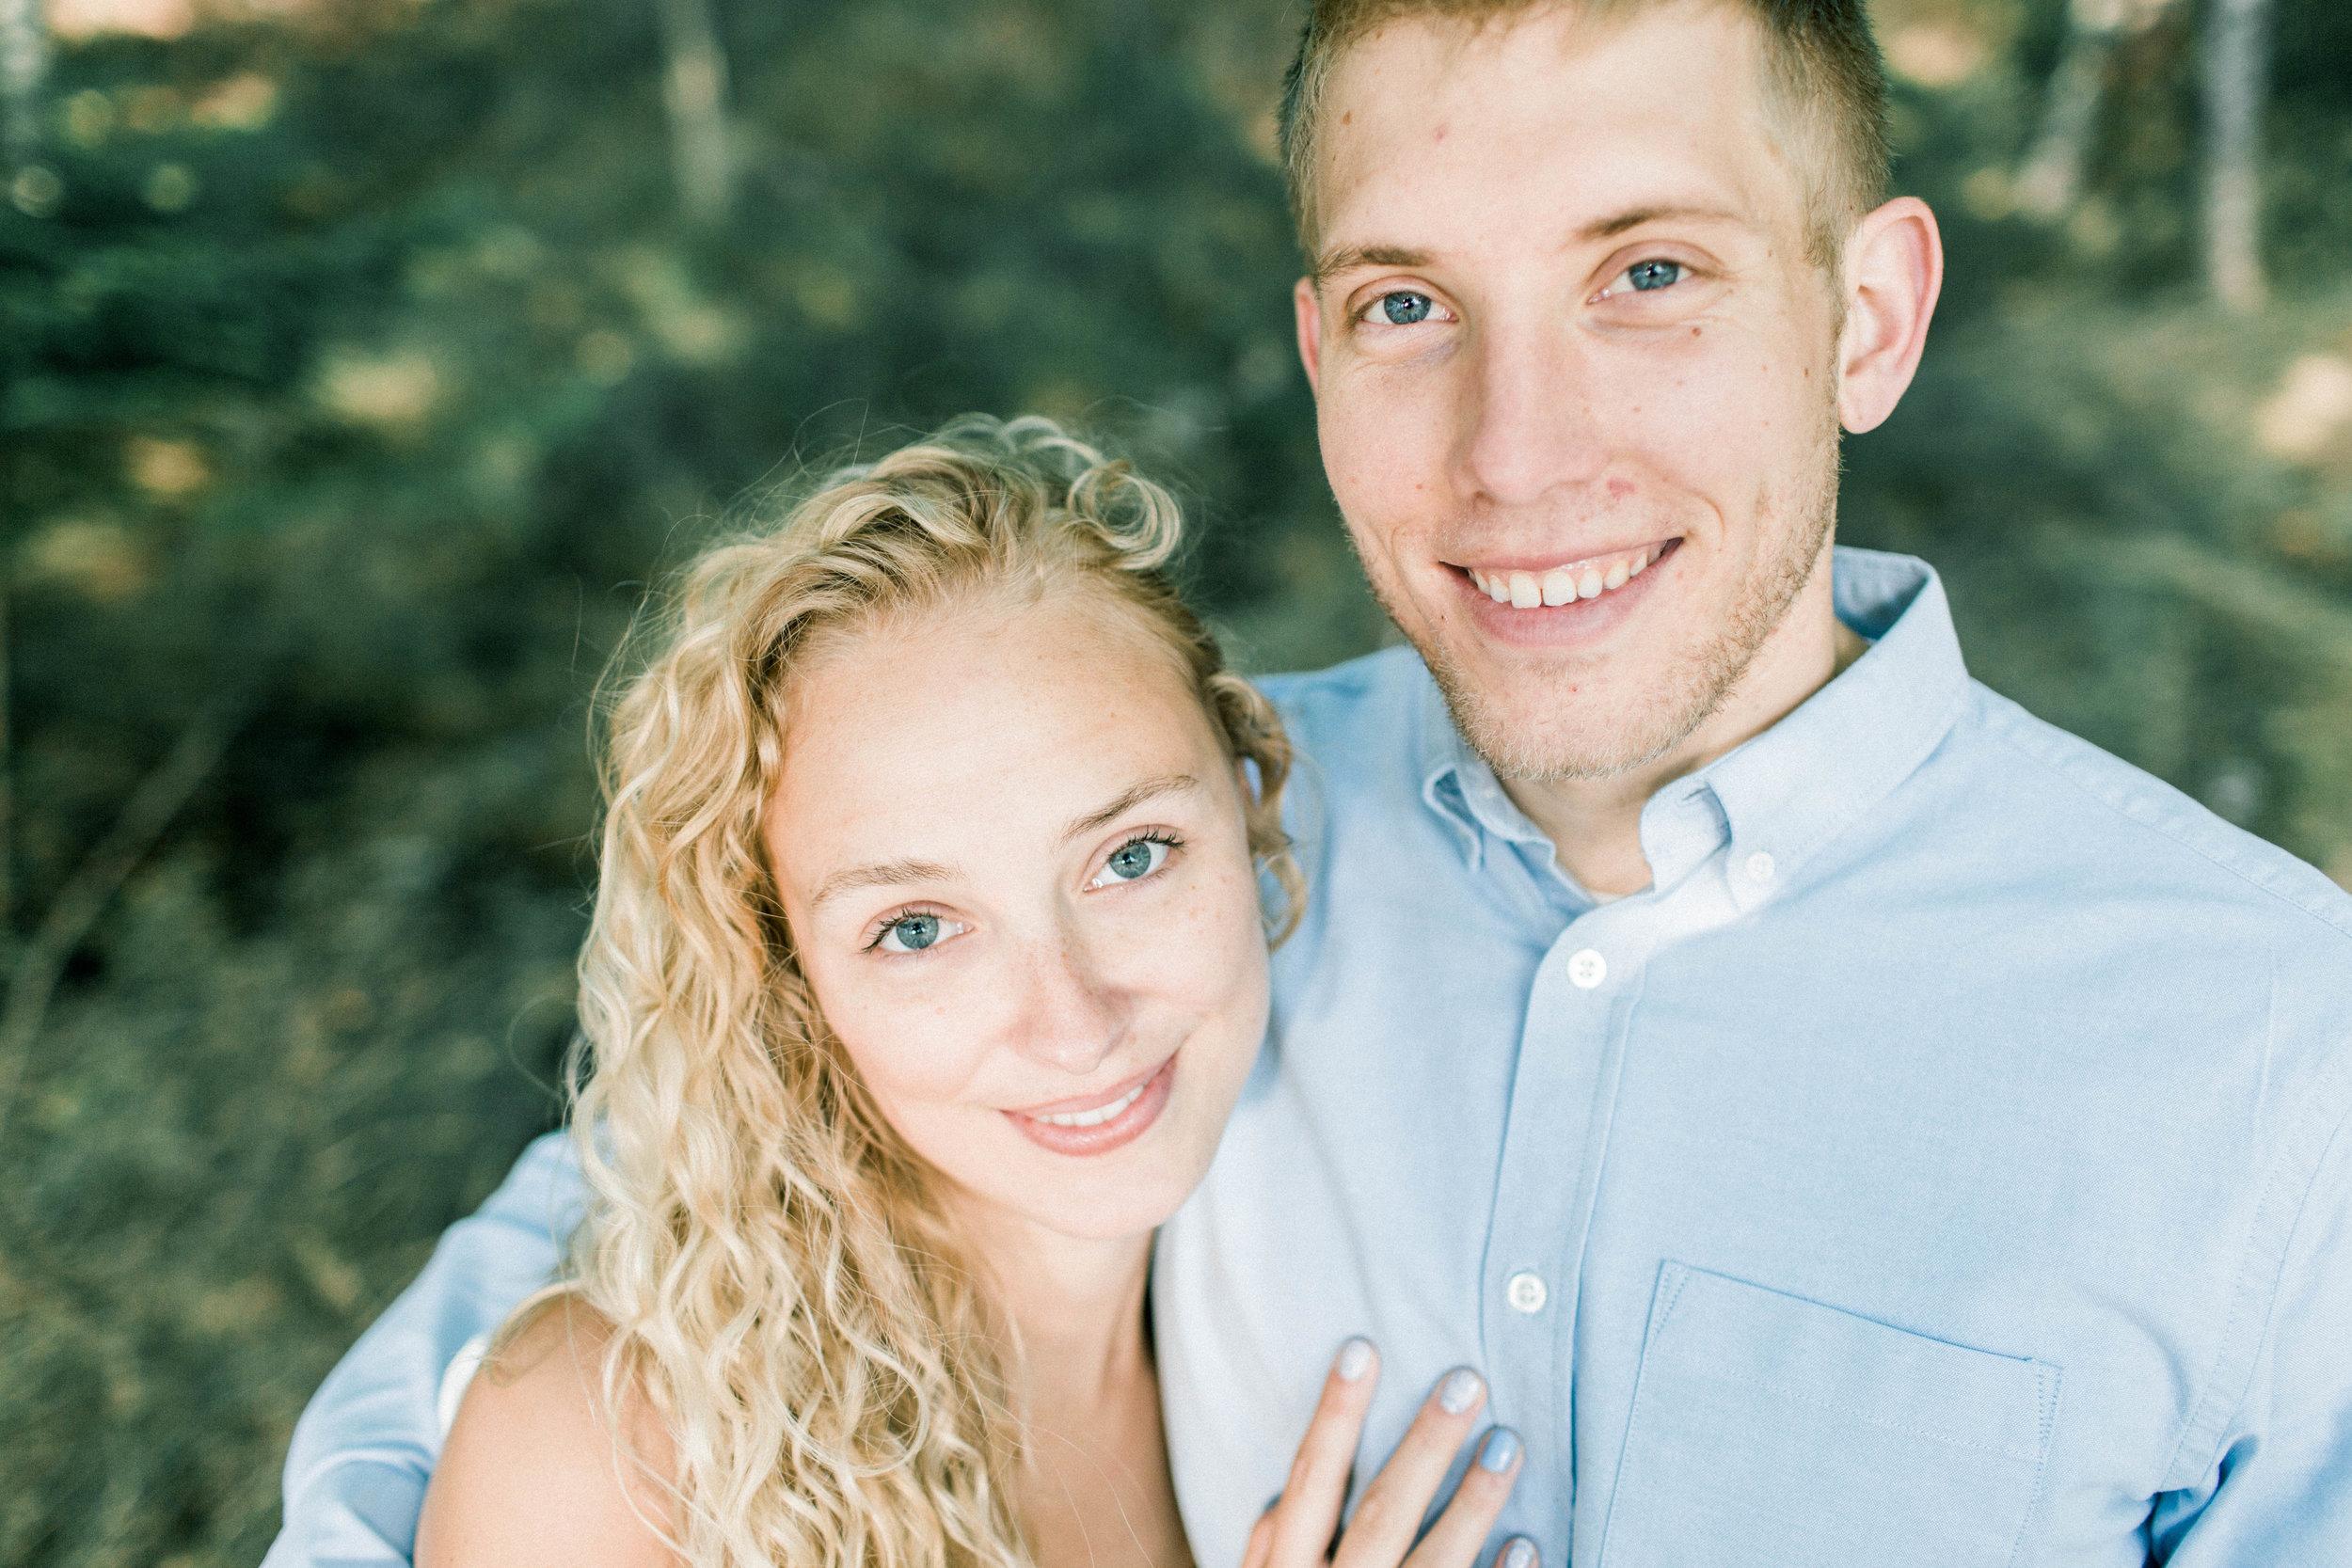 Northern Michigan Engagement Photographer - Lauren and Brent 035.jpg